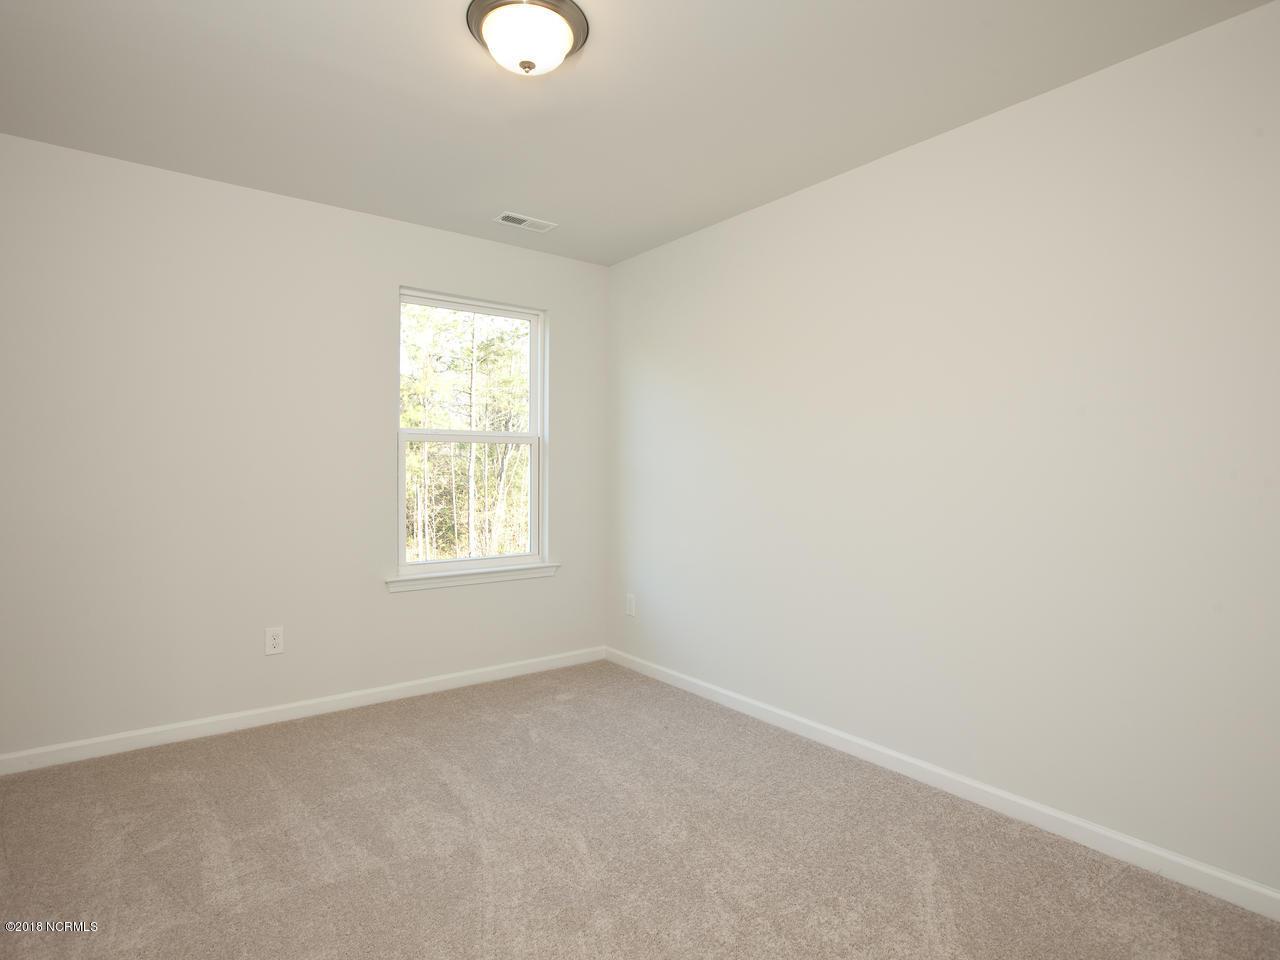 9704 Woodriff Circle #lot 80 Leland, NC 28451